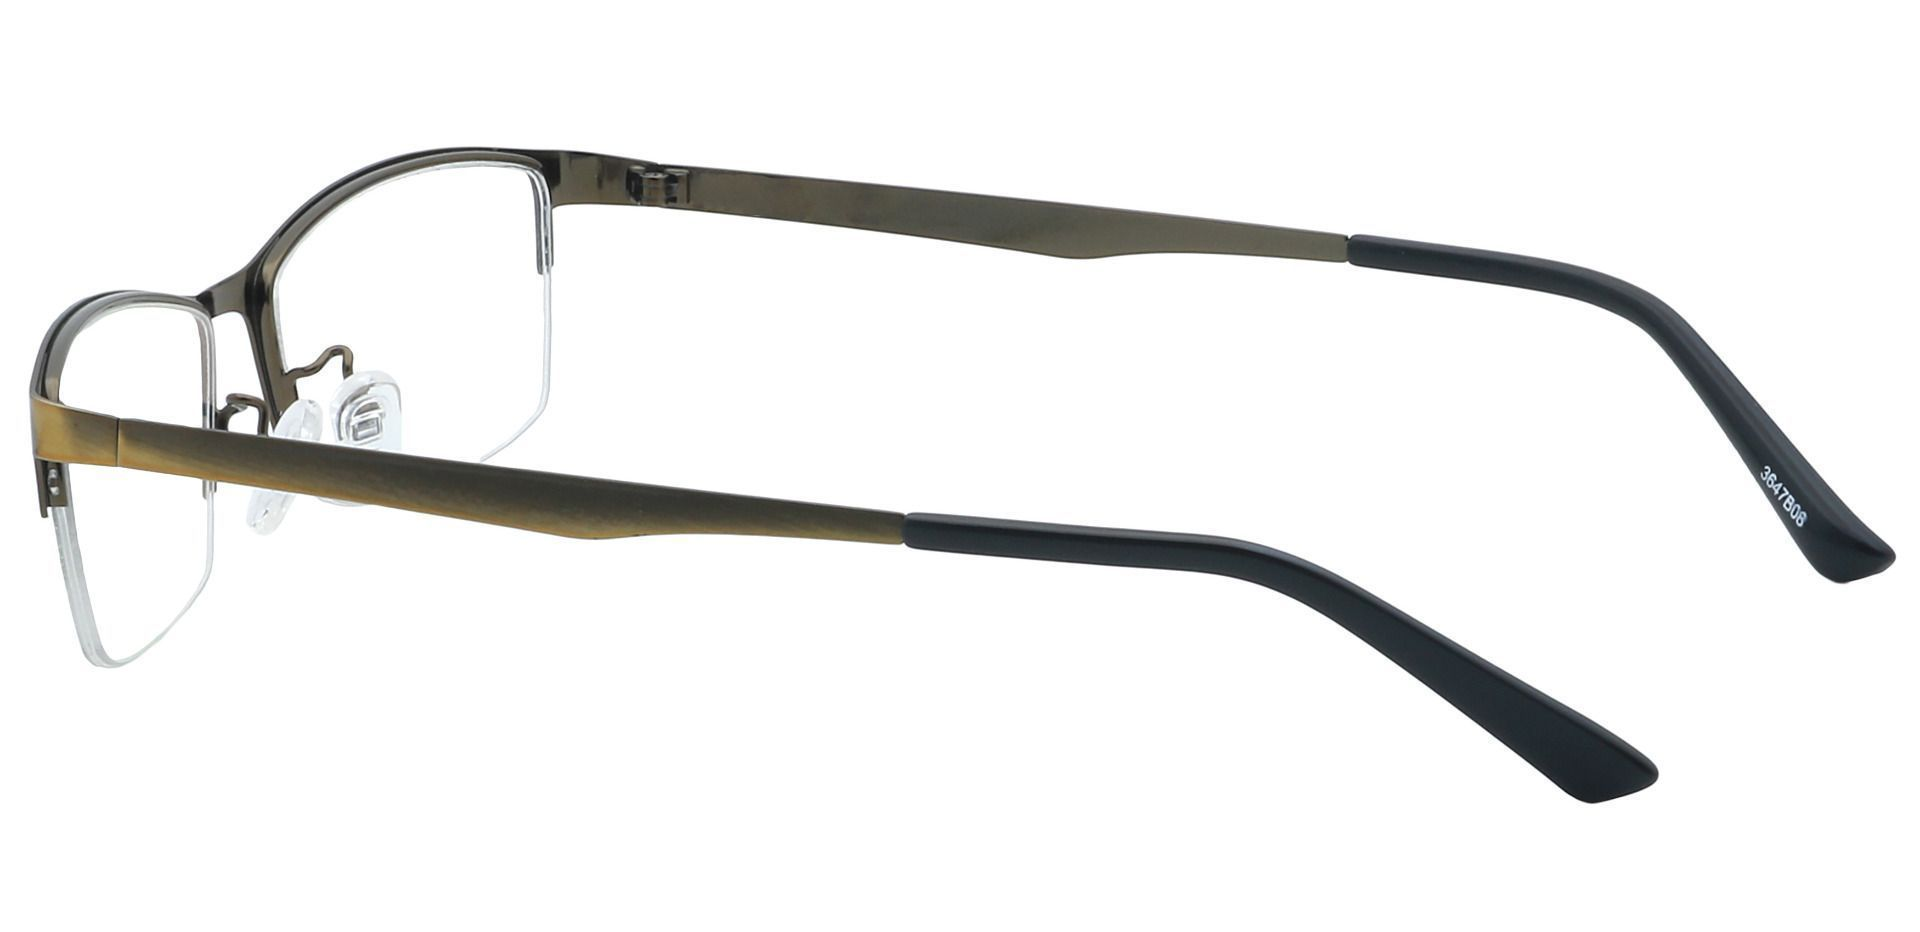 Willis Rectangle Blue Light Blocking Glasses - Brown